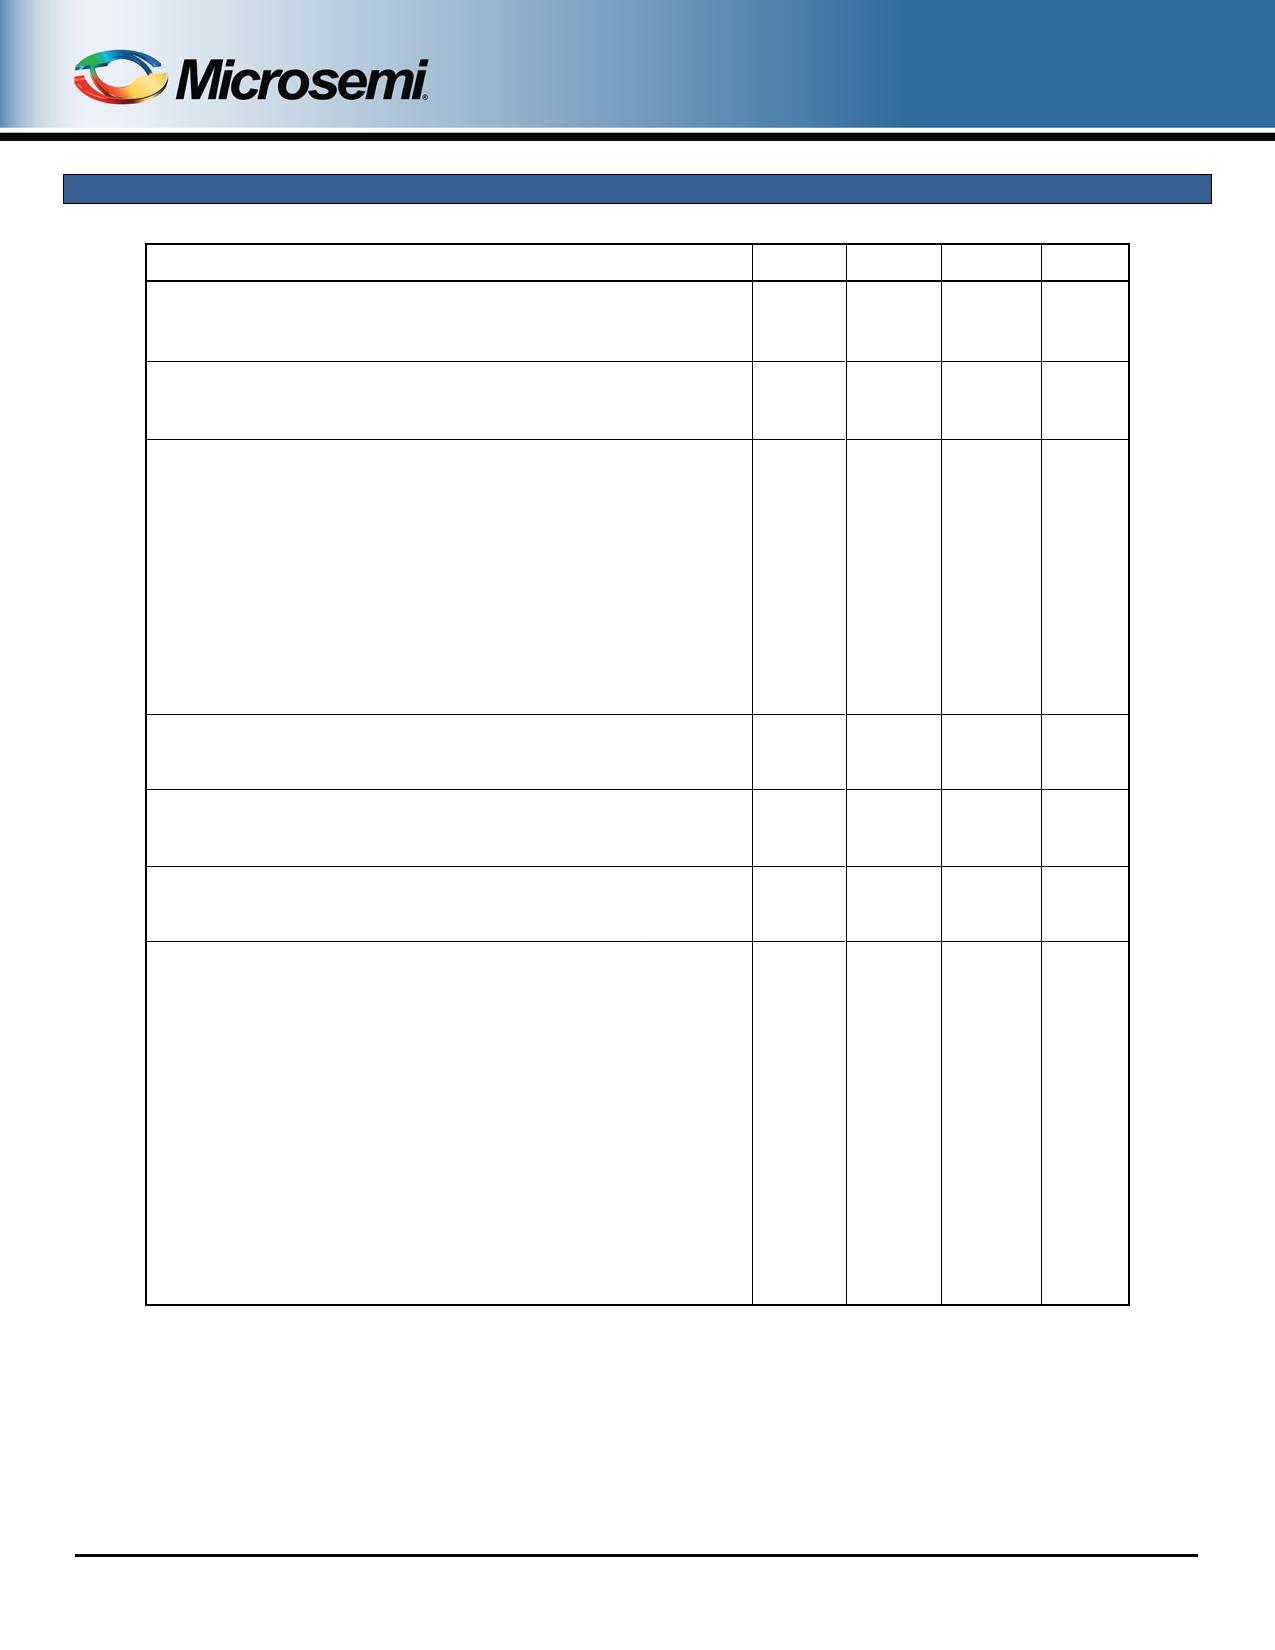 2N690 pdf, 반도체, 판매, 대치품